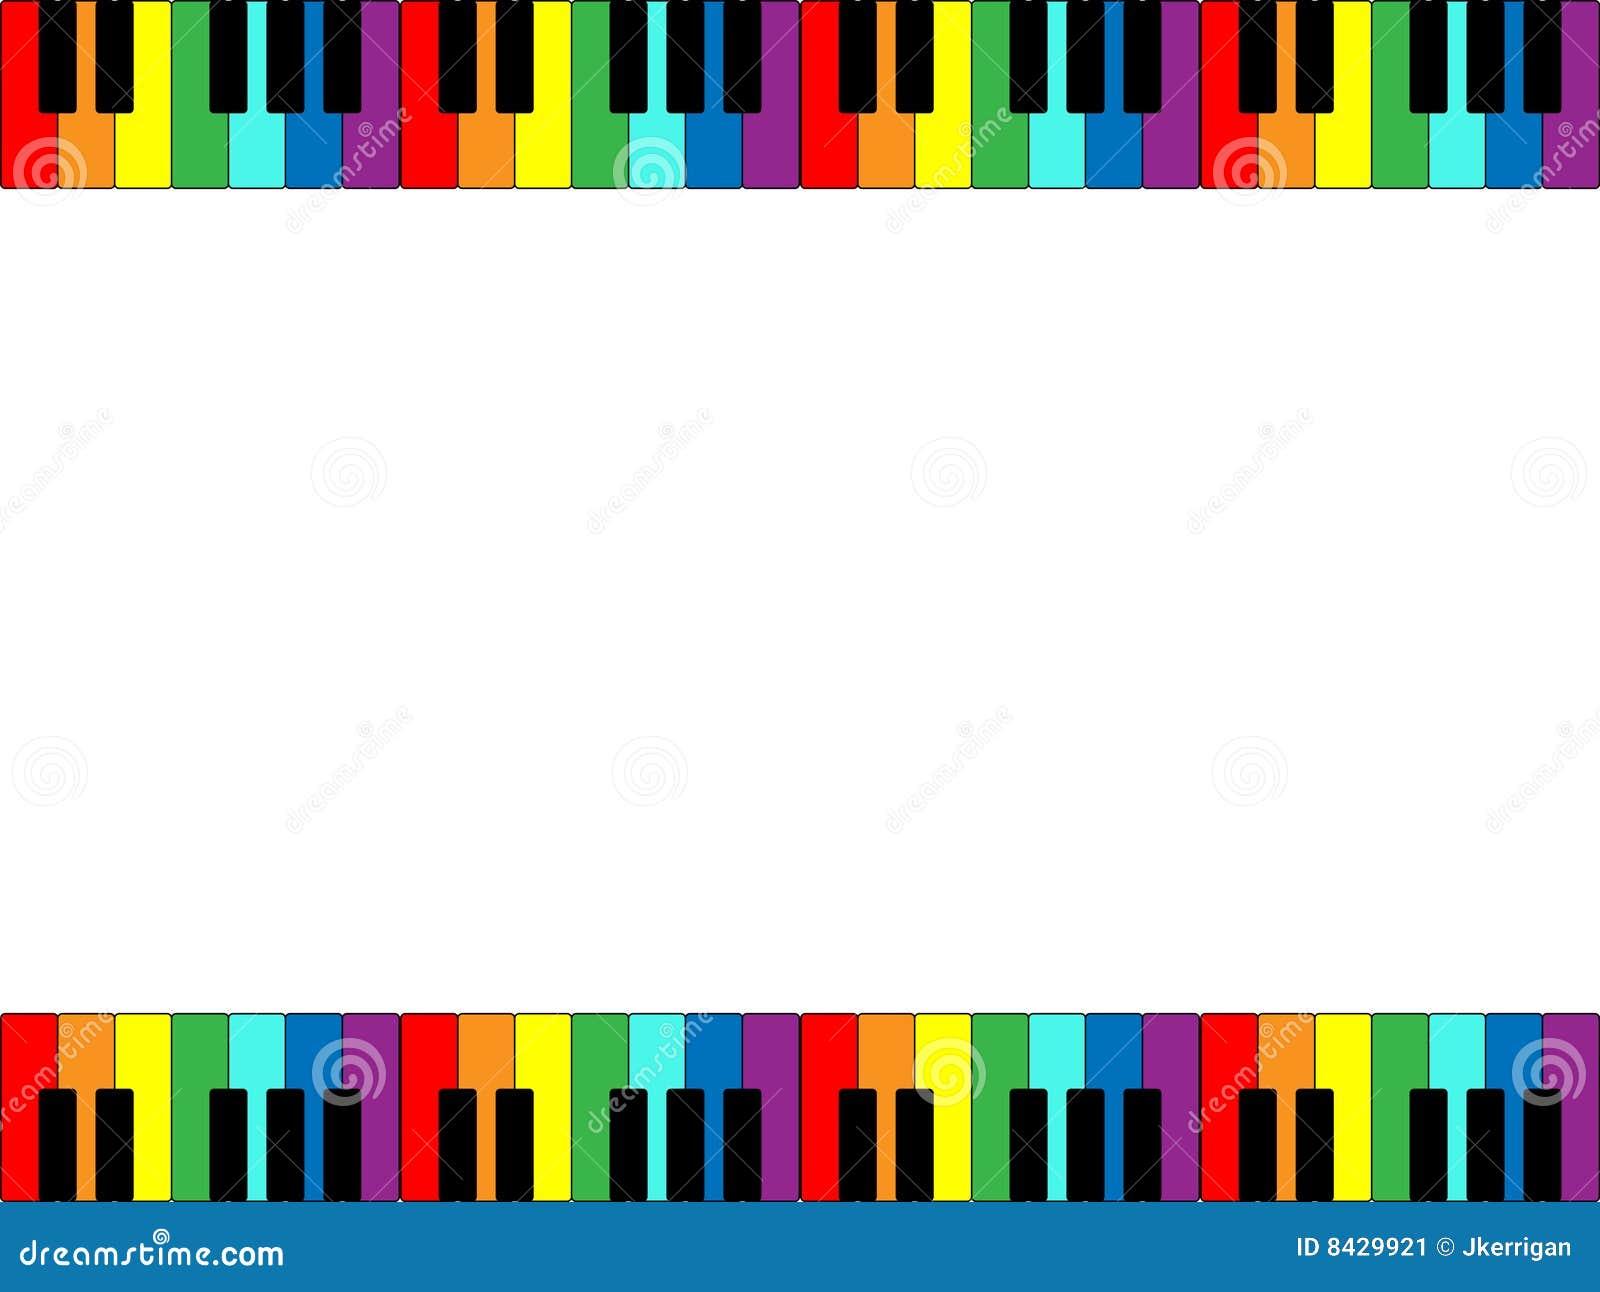 Piano Keyboard Border